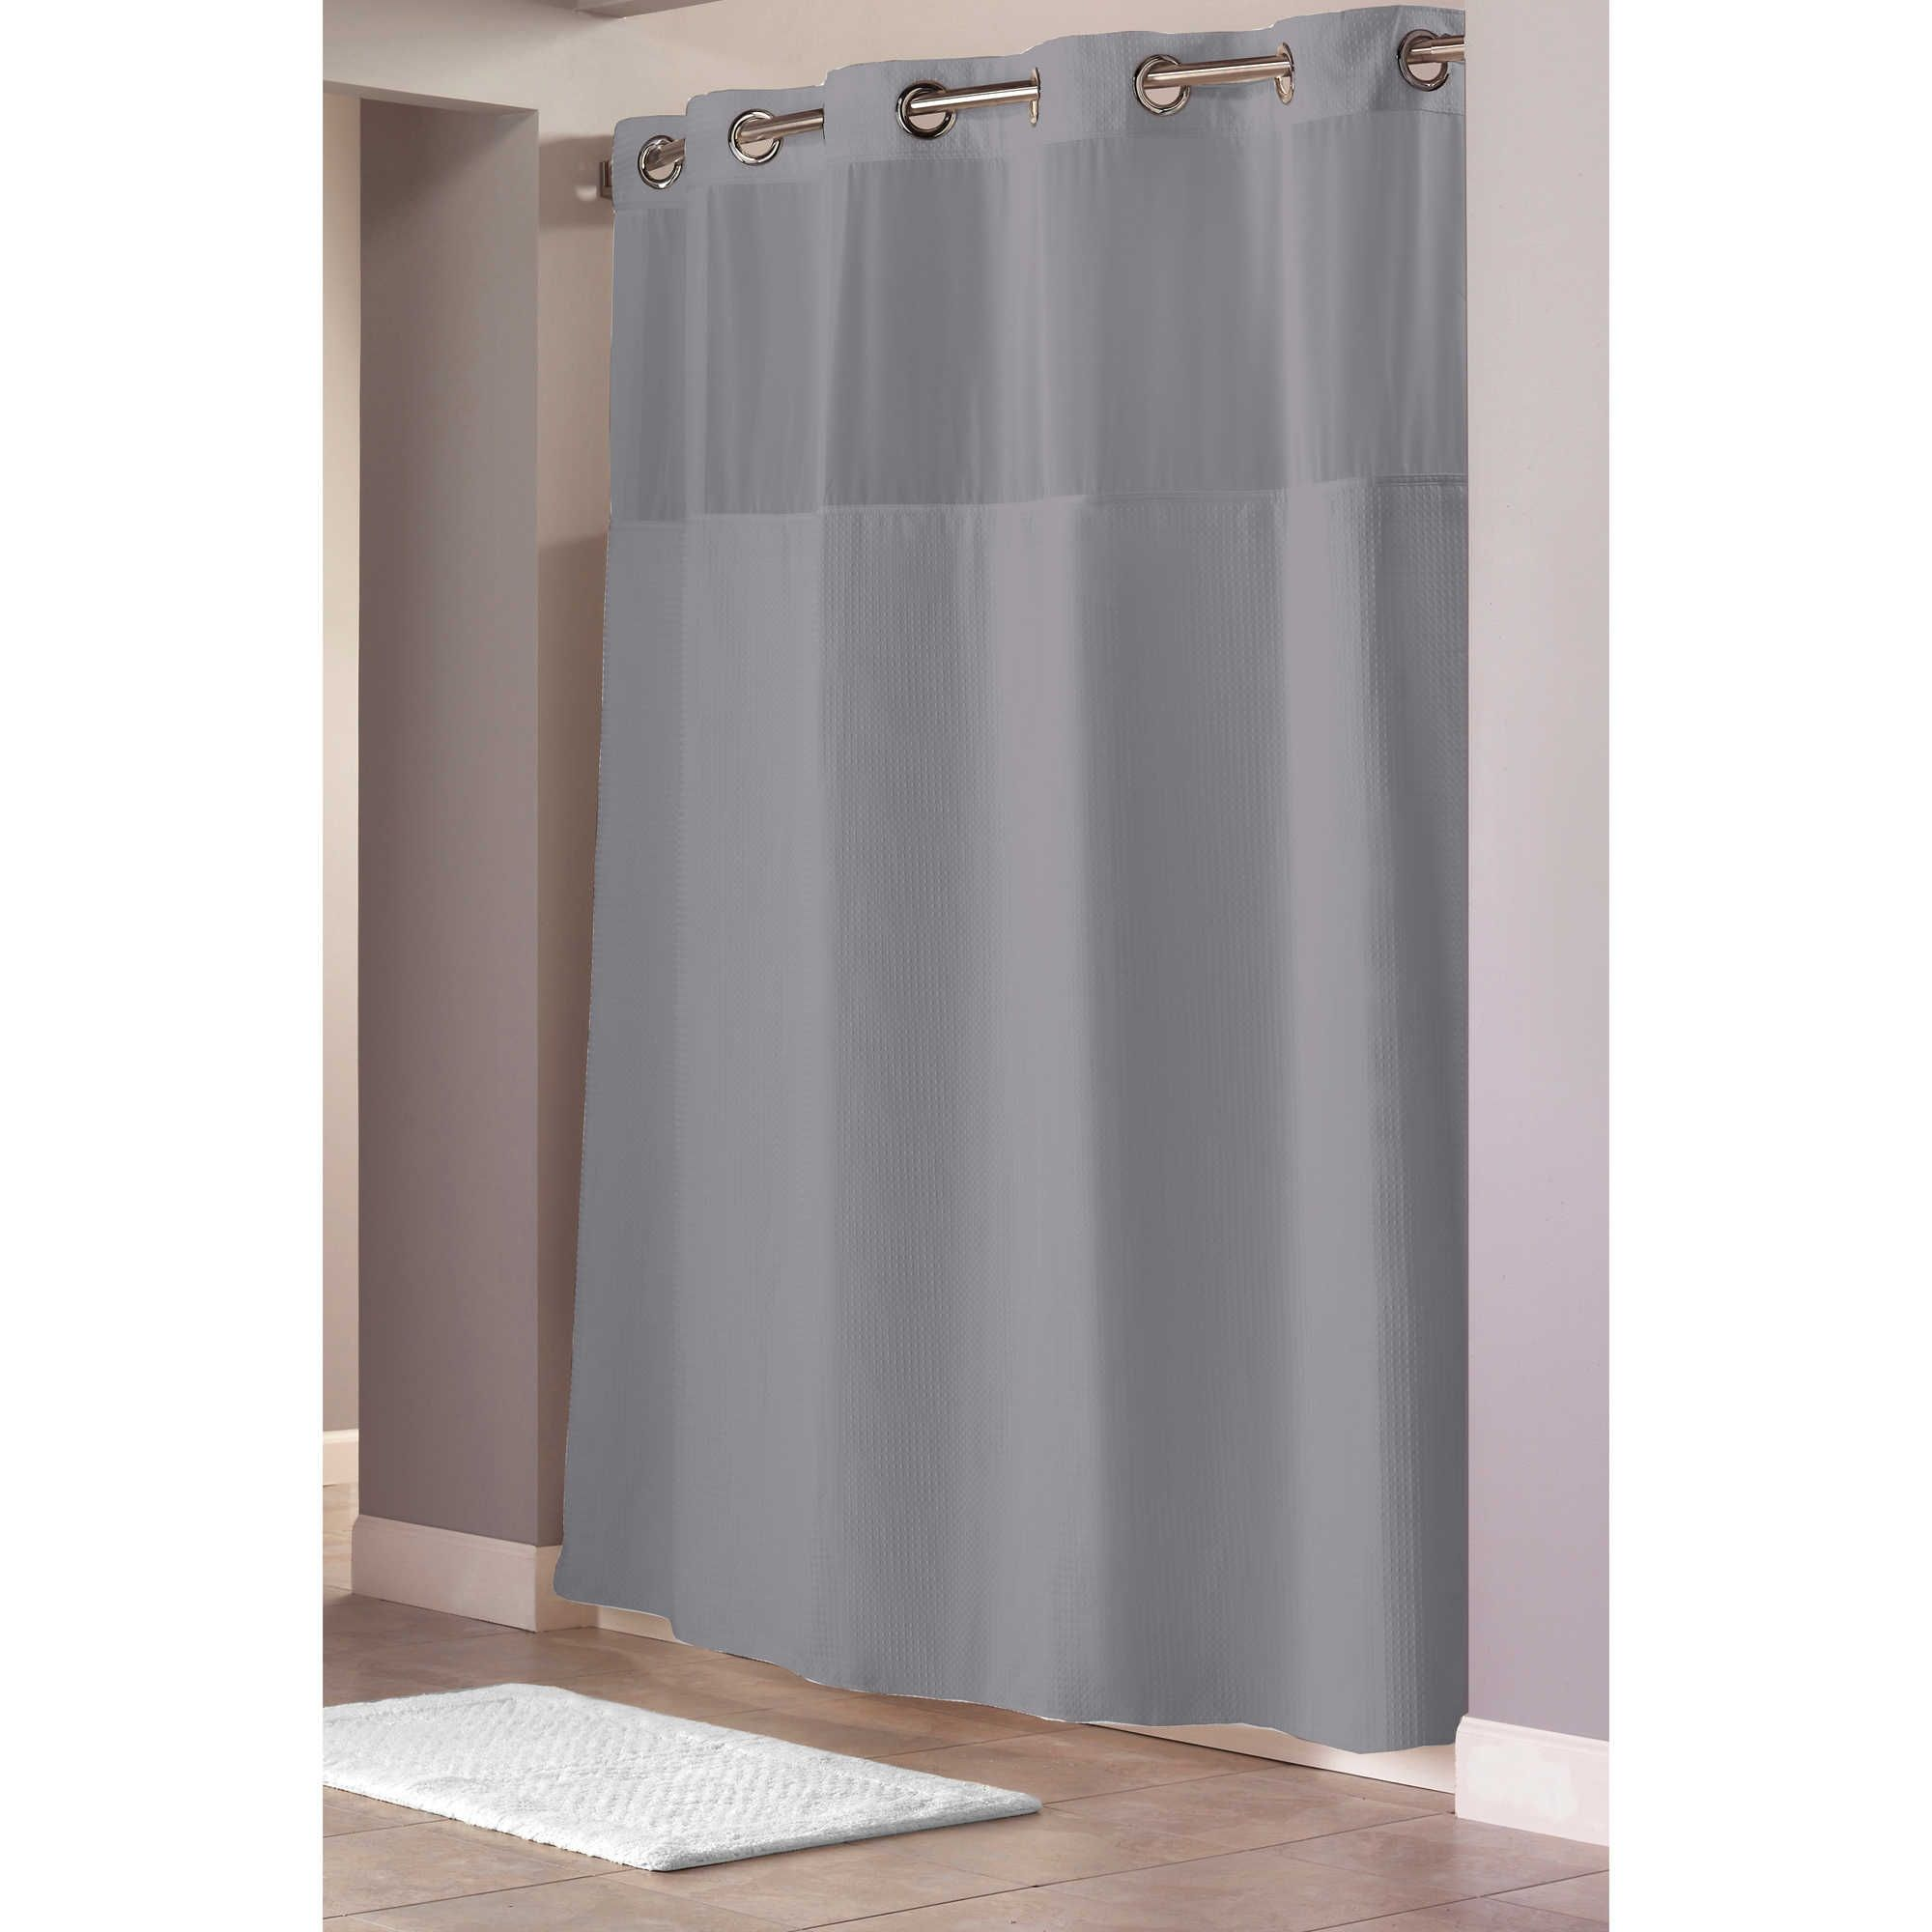 78 Shower Curtain Liner | Shower Curtain | Pinterest